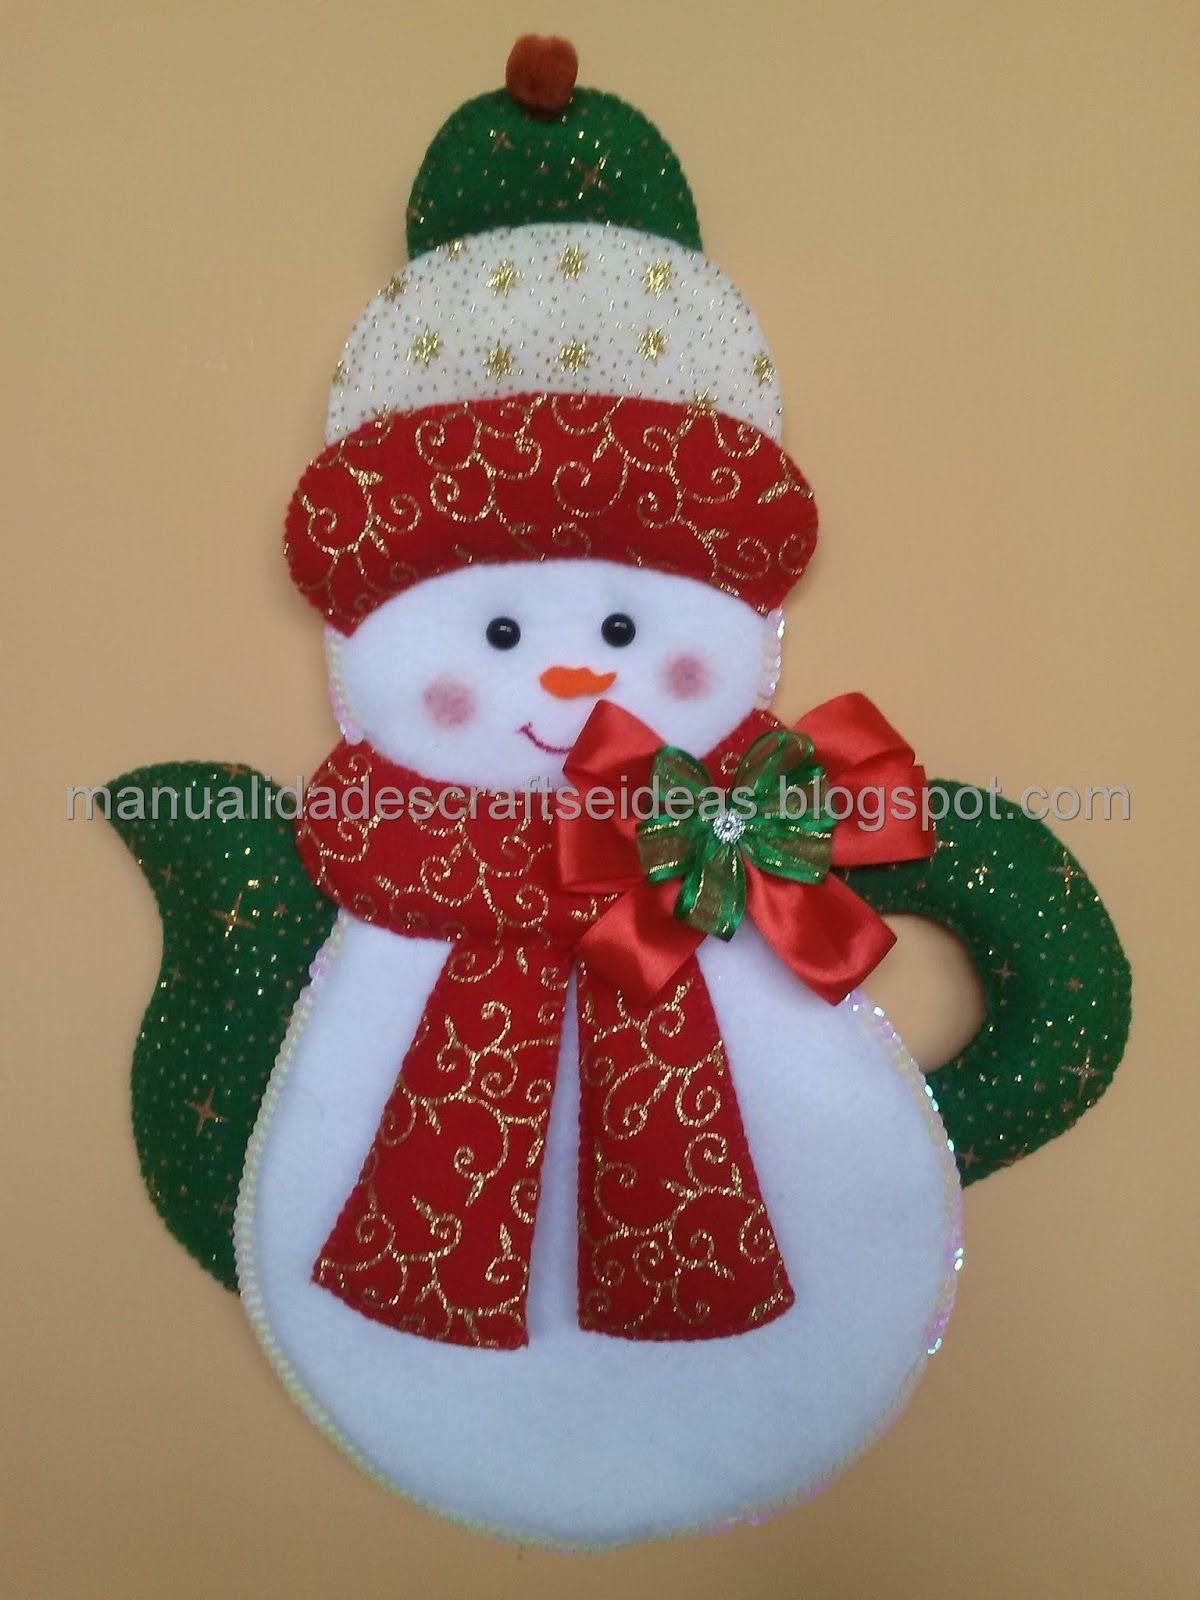 Mu ecos nieves teteras navide as pa o lency fieltro for Navidad adornos manualidades navidenas